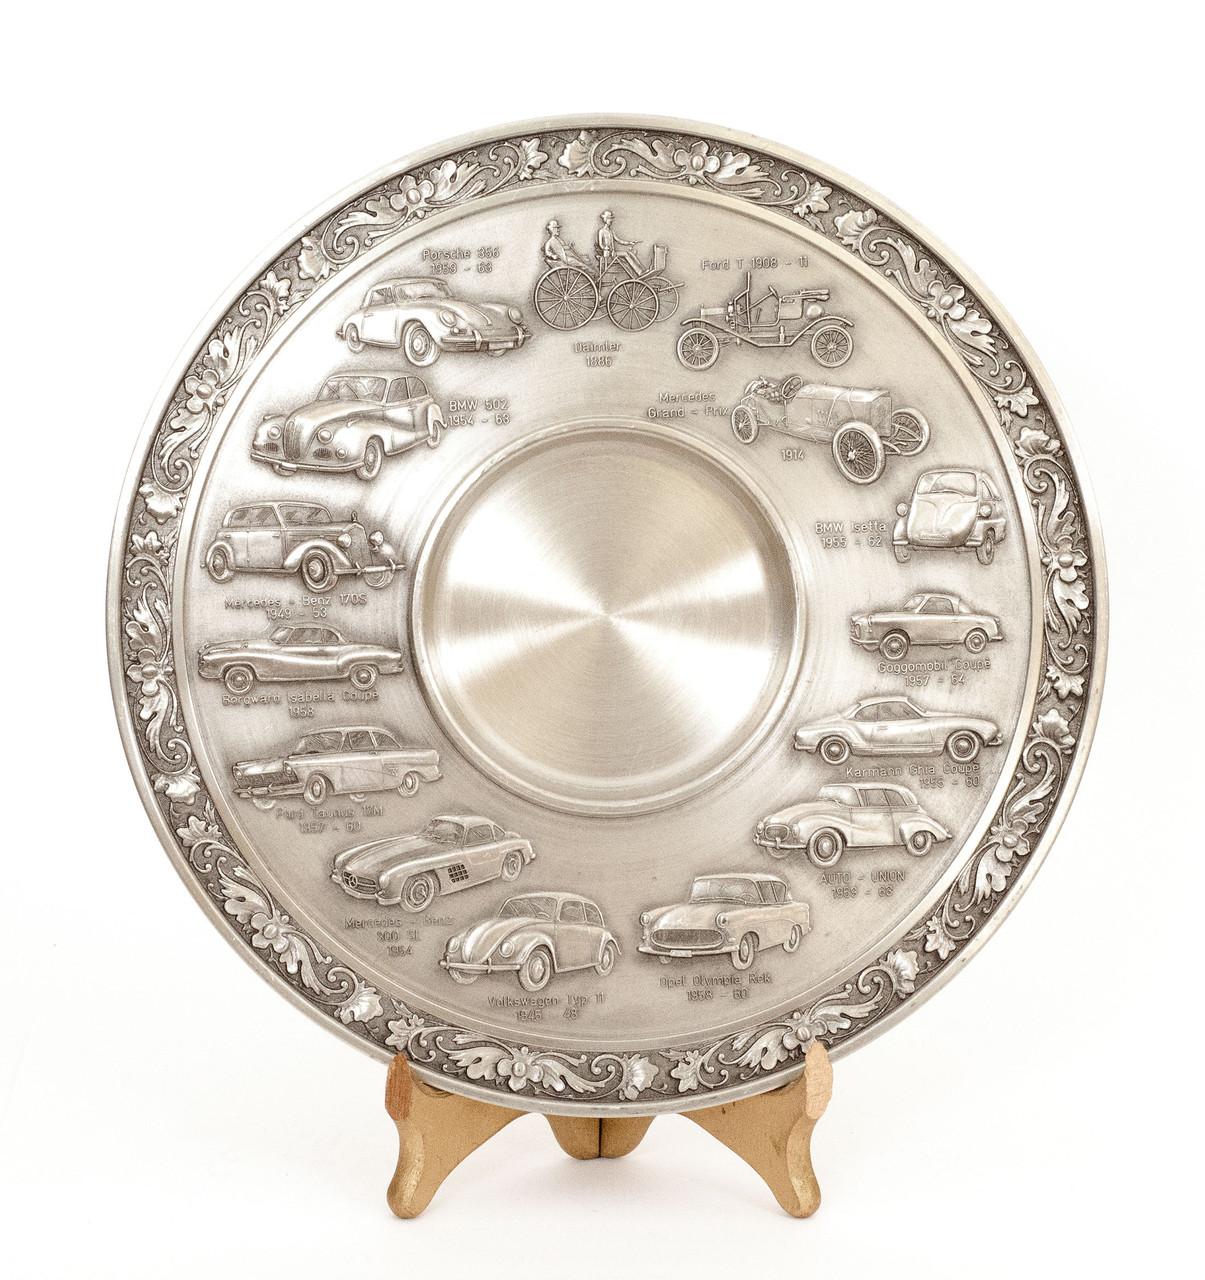 Тарелка оловянная, олово, Германия, история автопрома